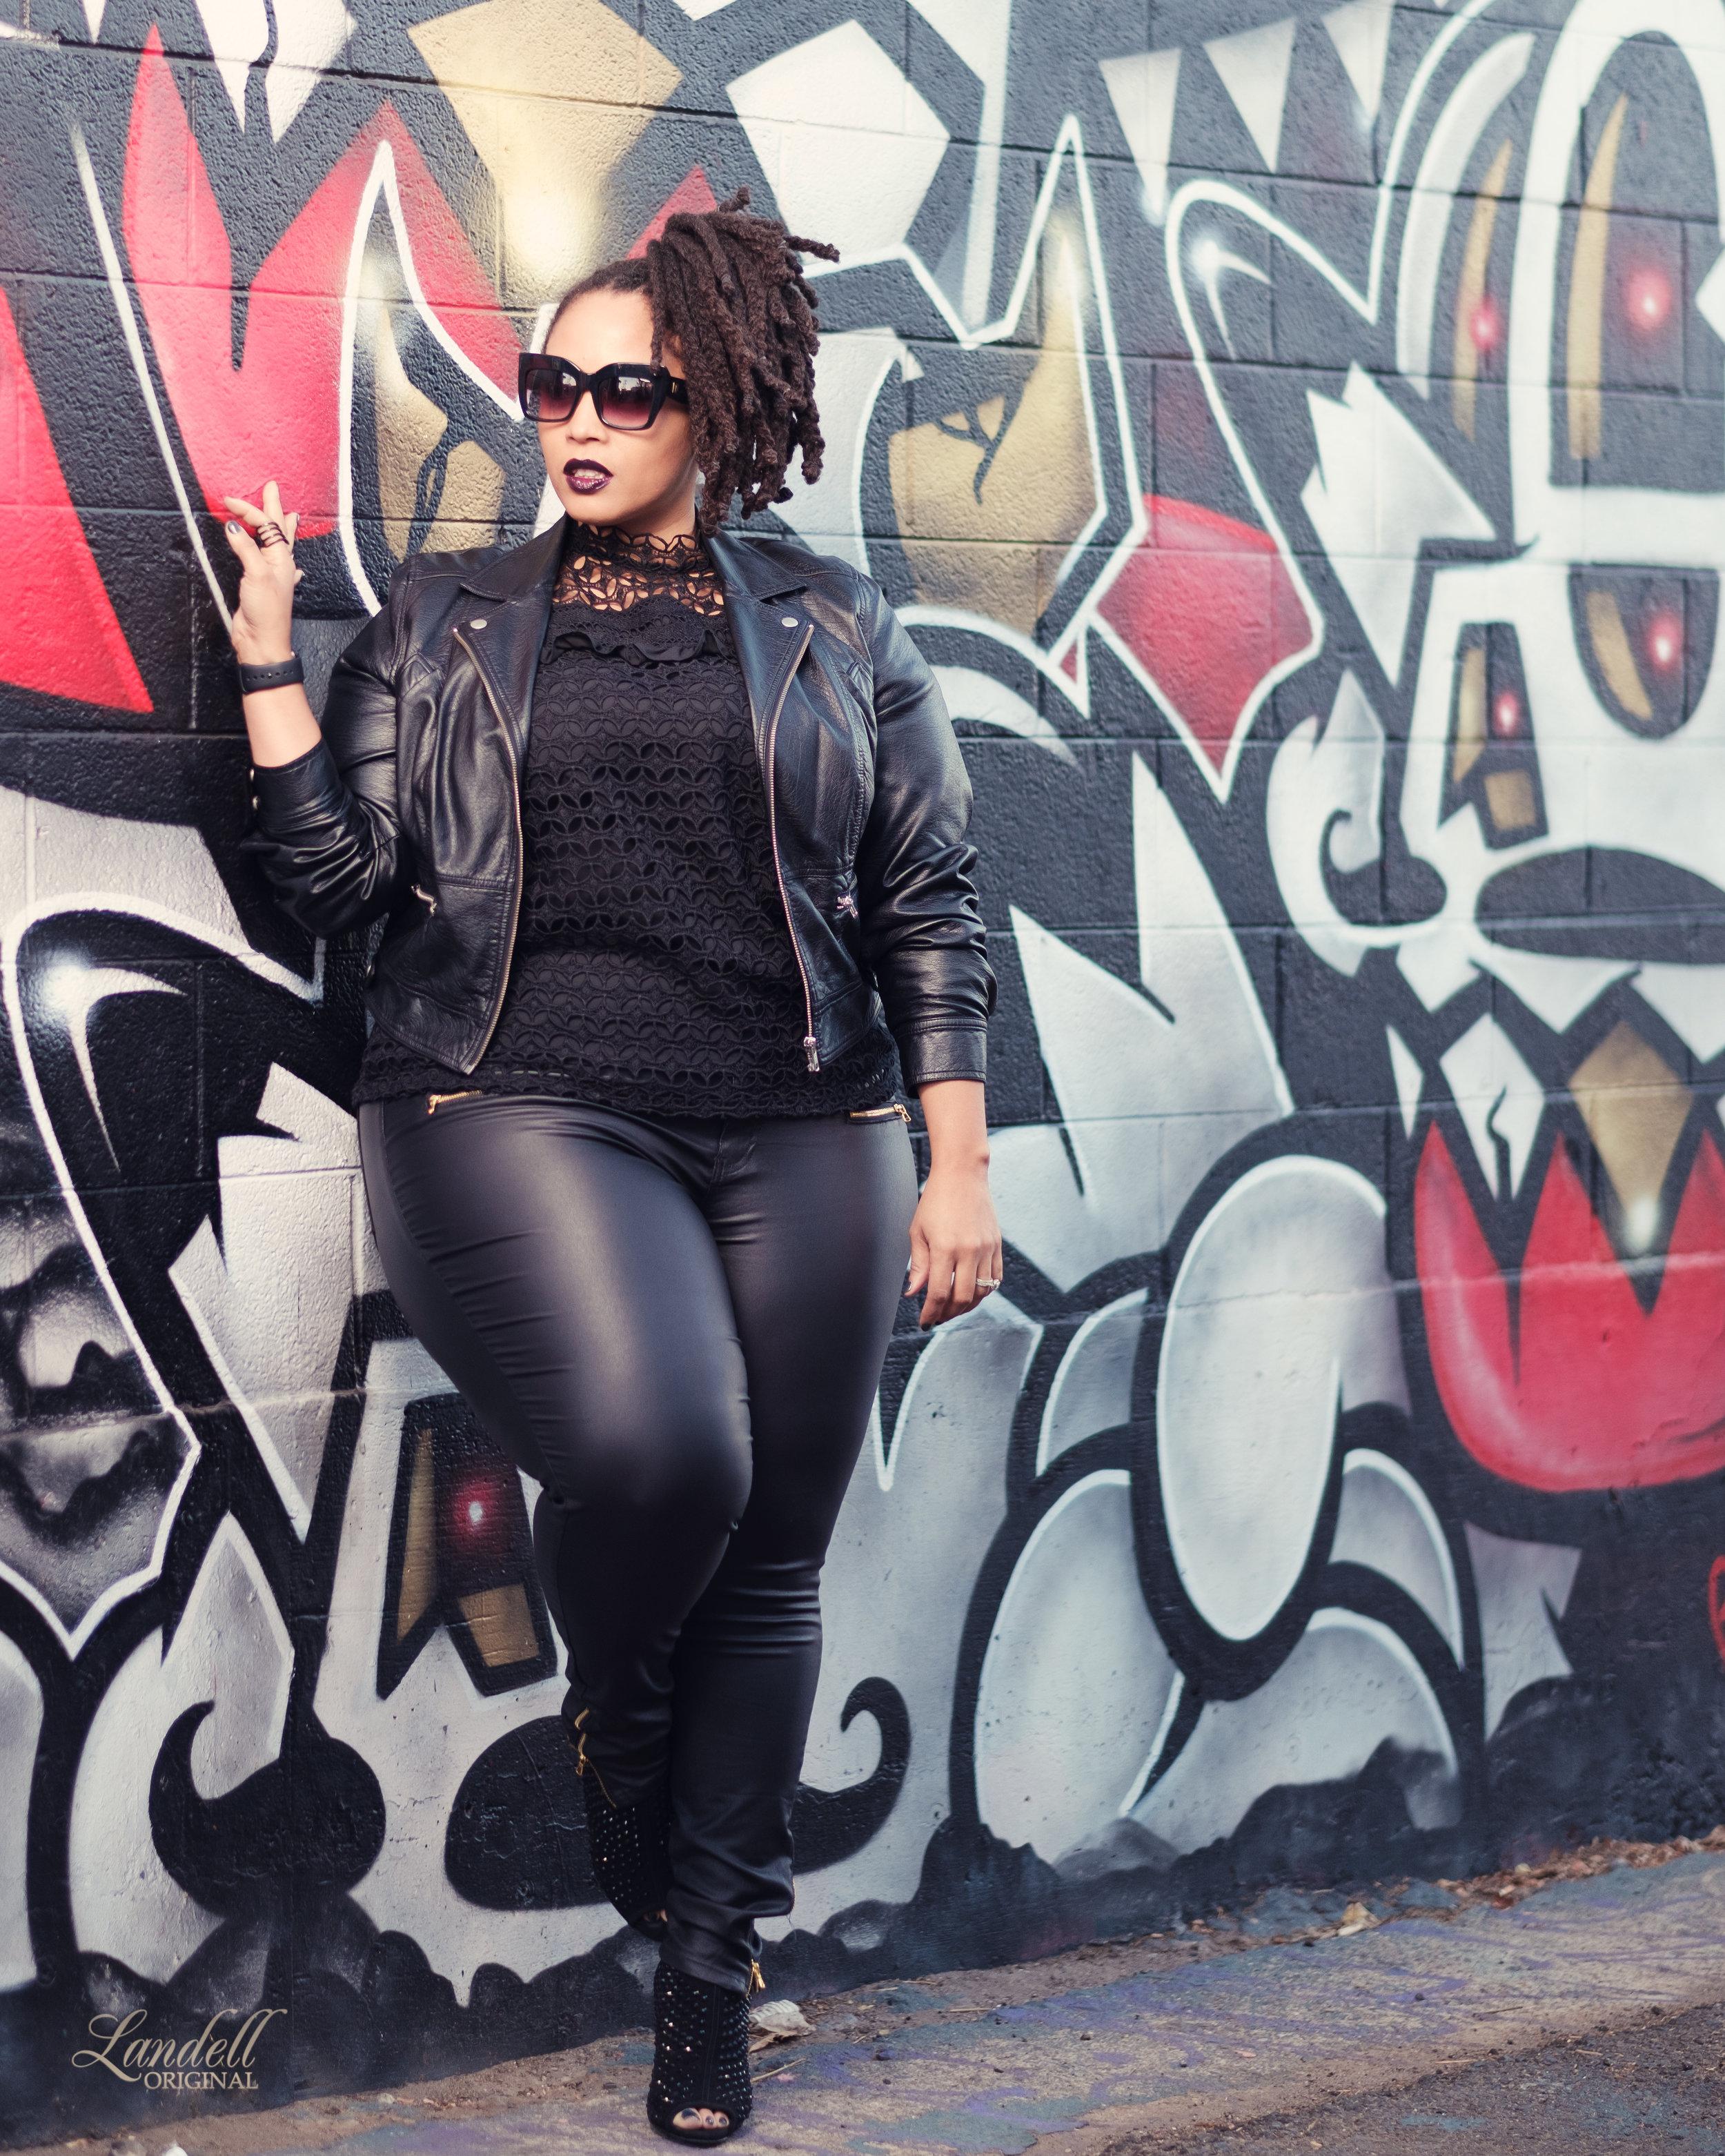 Jacket |  CityChic   Top |  Eloquii   Pants |  CityChic   Boots |  Michael Kors